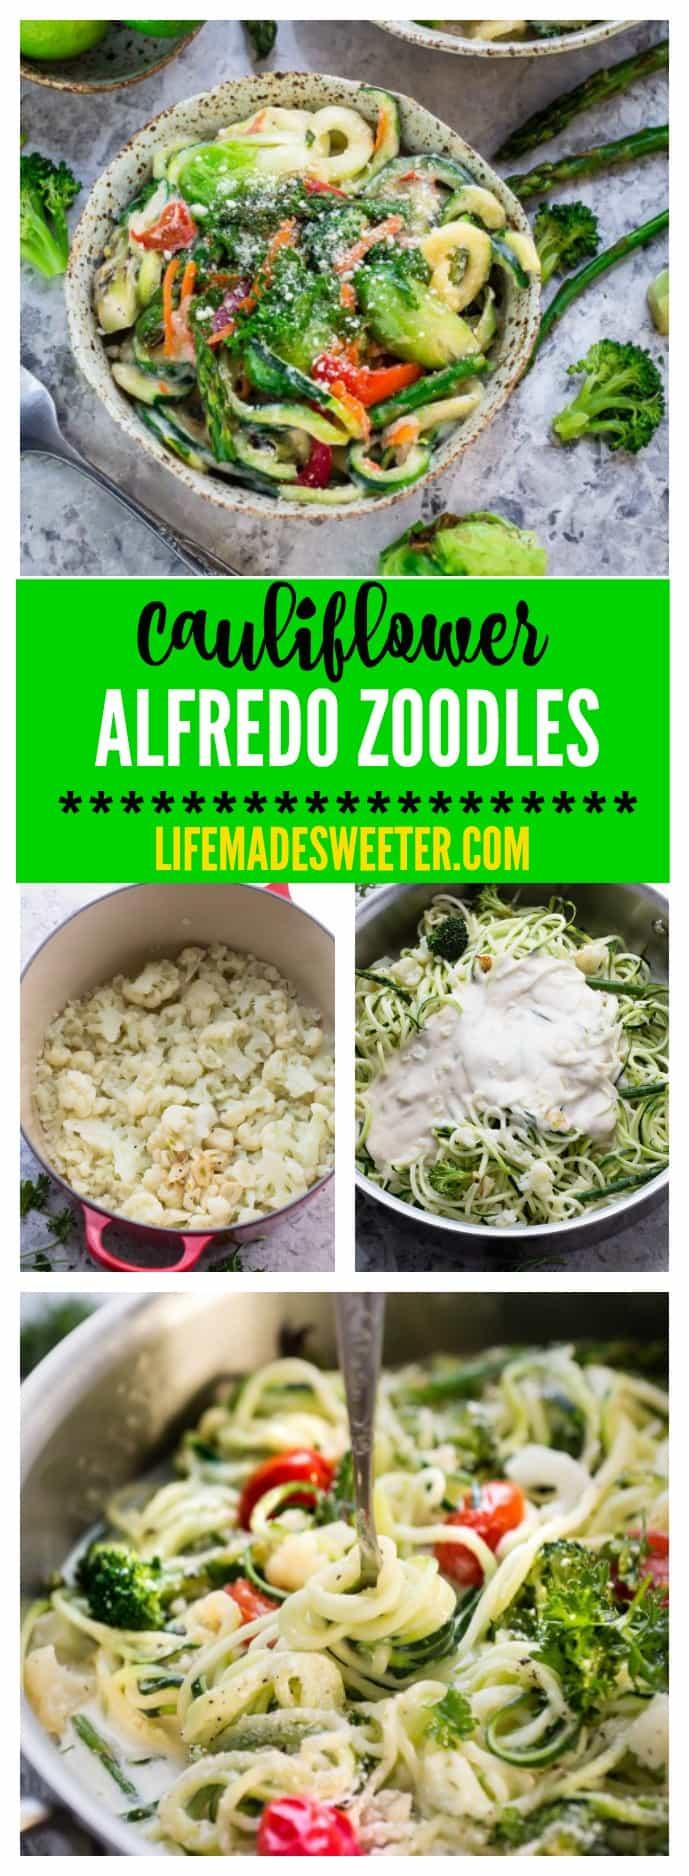 Zoodles Cauliflower Alfredo makes an easy & healthy weeknight meal. Gluten Free, Vegan, Paleo, Whole 30 -